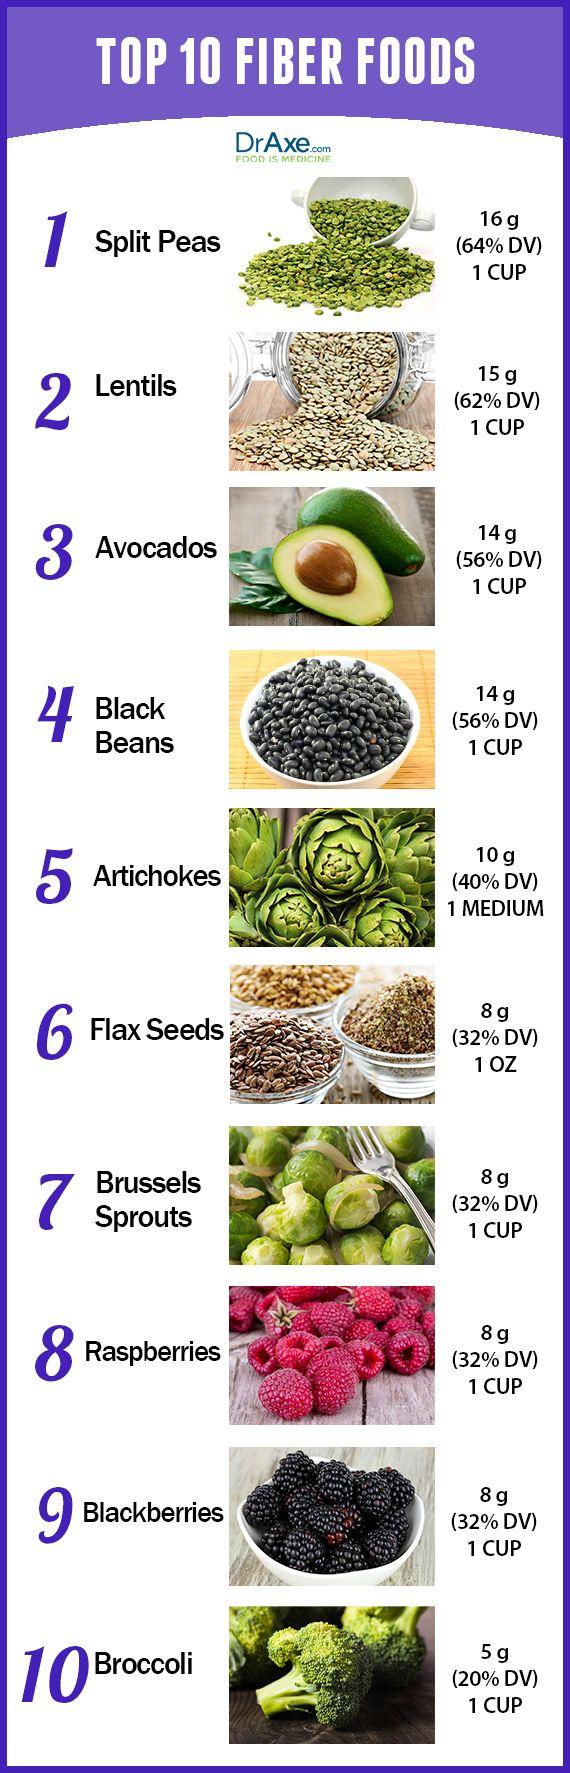 SOLUBLE FIBER, CHOLESTEROL & BLOOD-SUGAR - Oats, Nuts, Beans, & Fruit.  ~  INSOLUBLE FIBER ADDS BULK - Veggies & Whole grains.